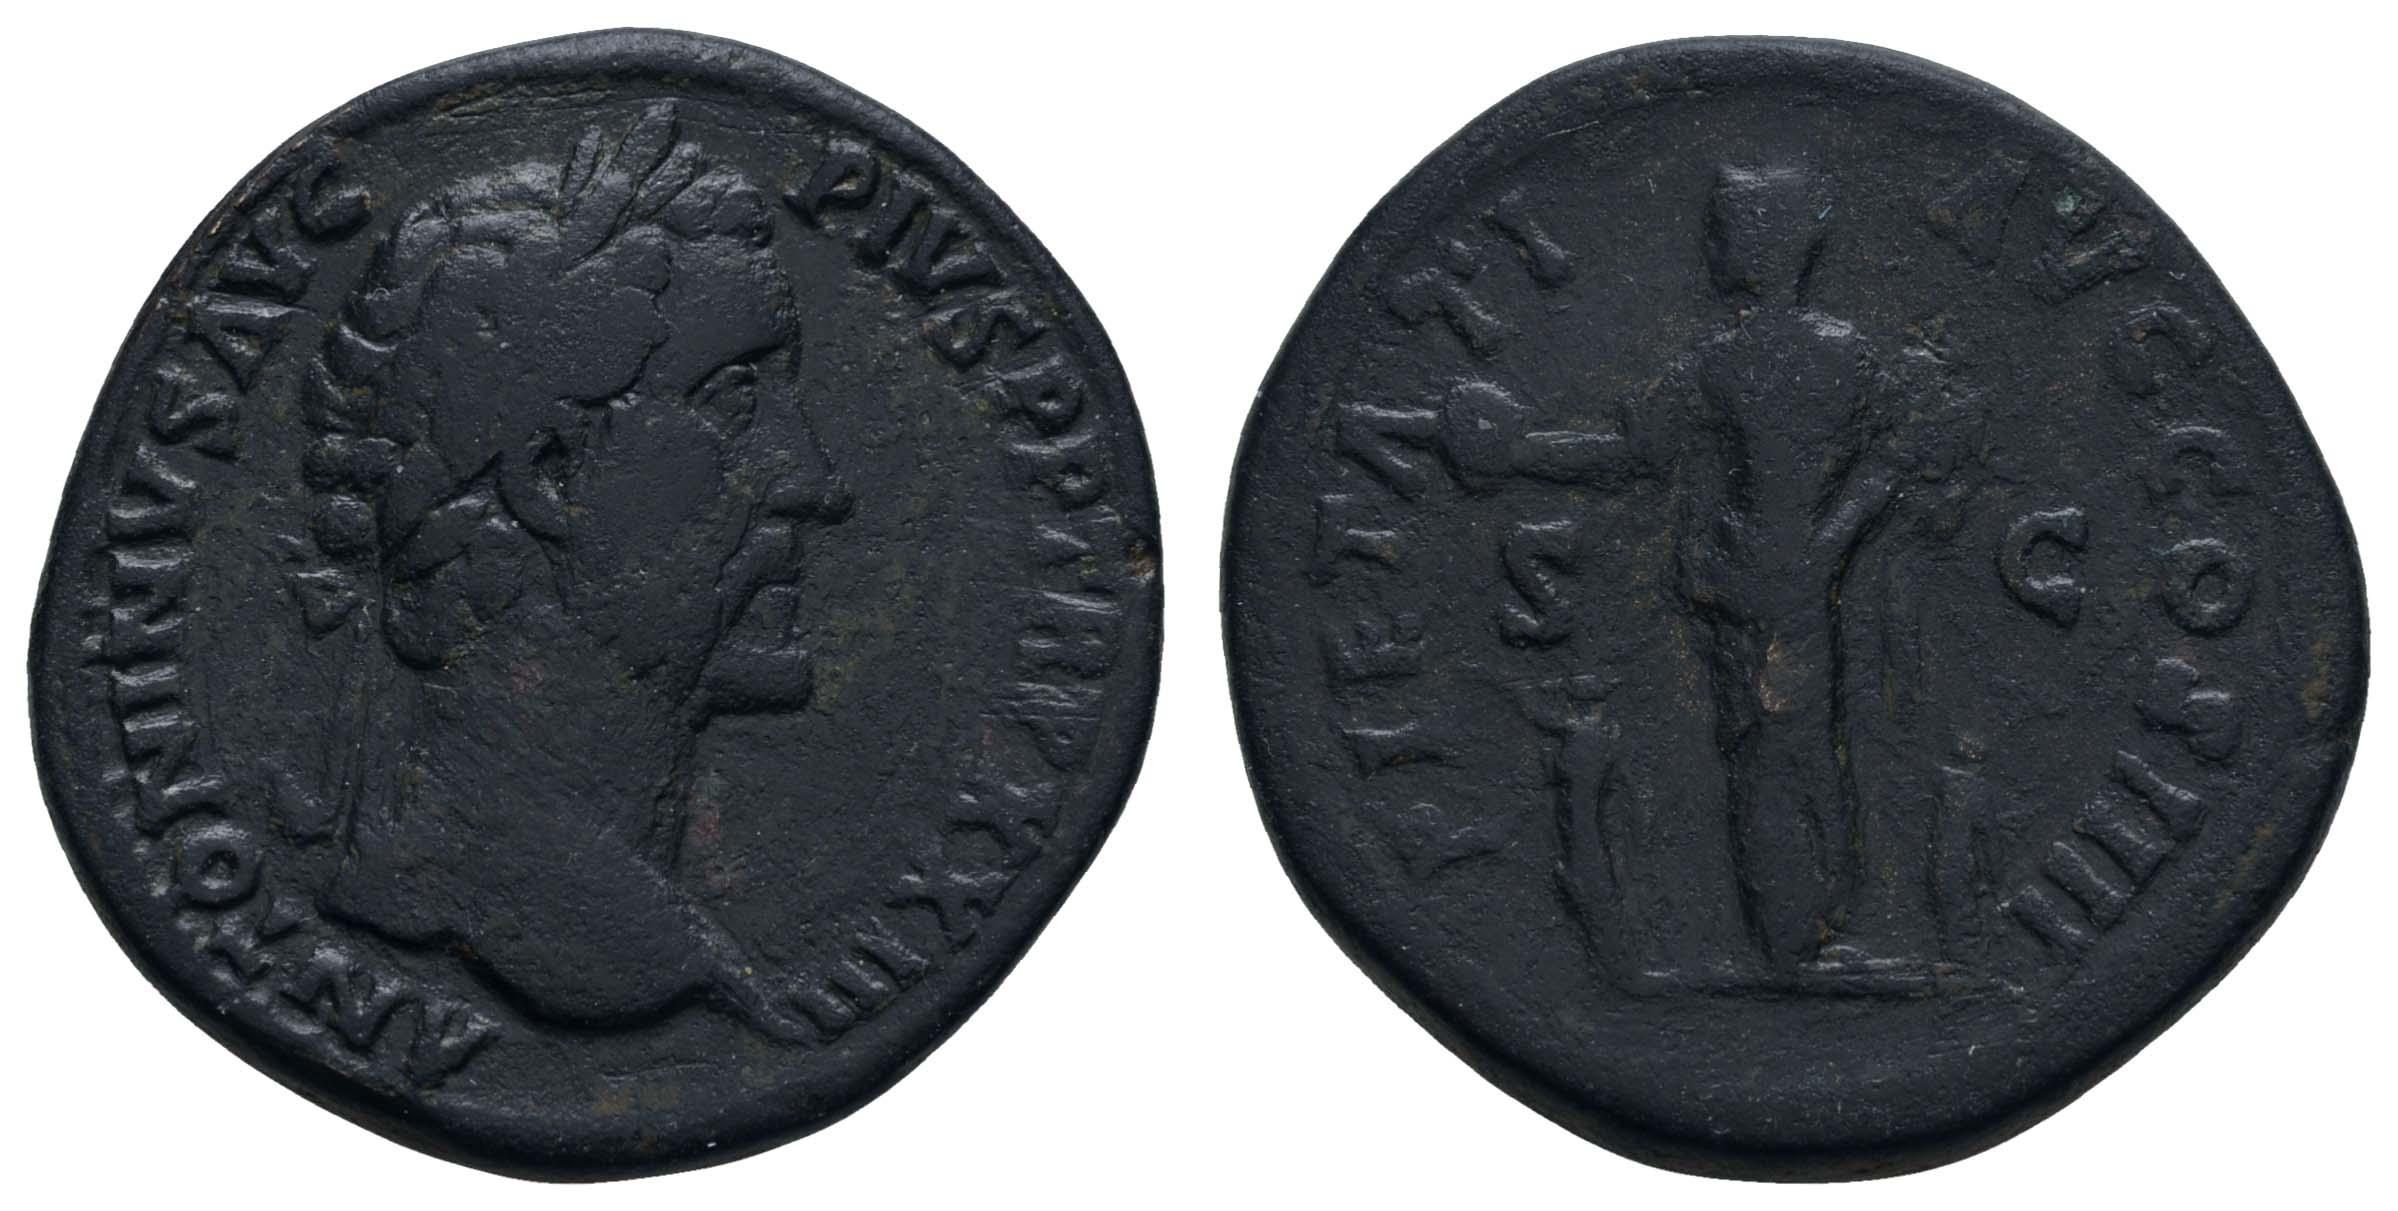 Lot 192 - Antike Römer - Kaiserzeit -  Auktionshaus Ulrich Felzmann GmbH & Co. KG Coins single lots